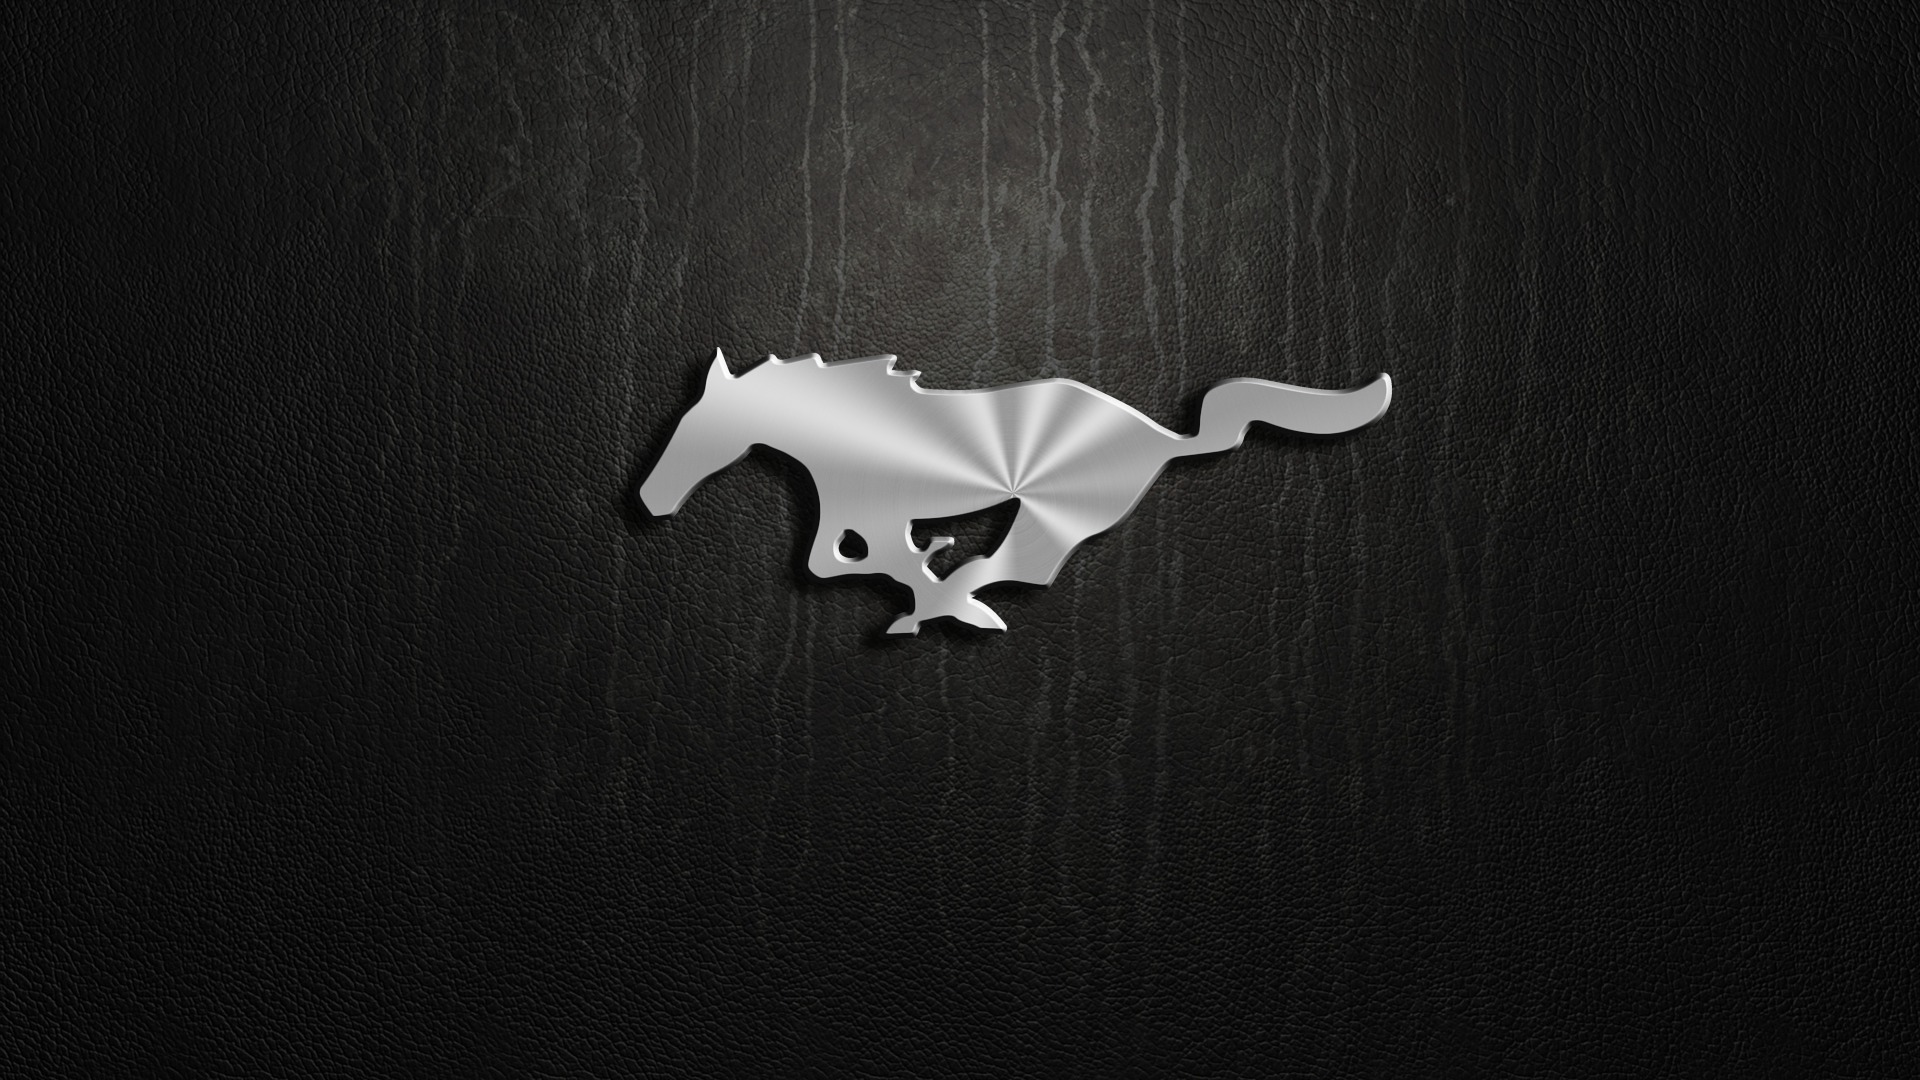 72+] Mustang Logo Wallpaper on WallpaperSafari.